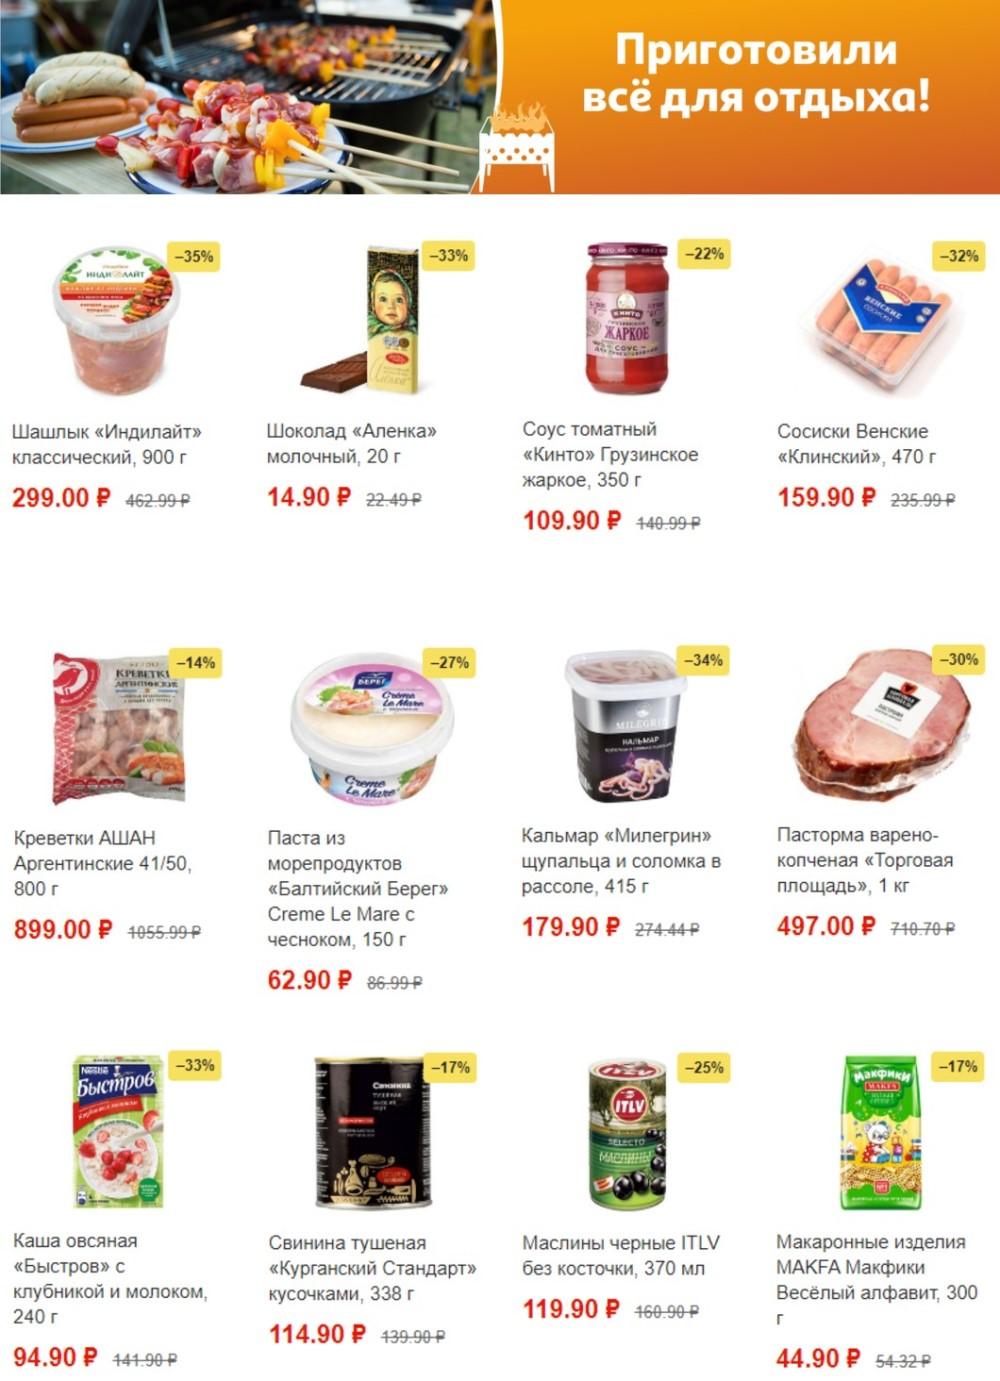 Новый каталог акций в Ашане г. Химки